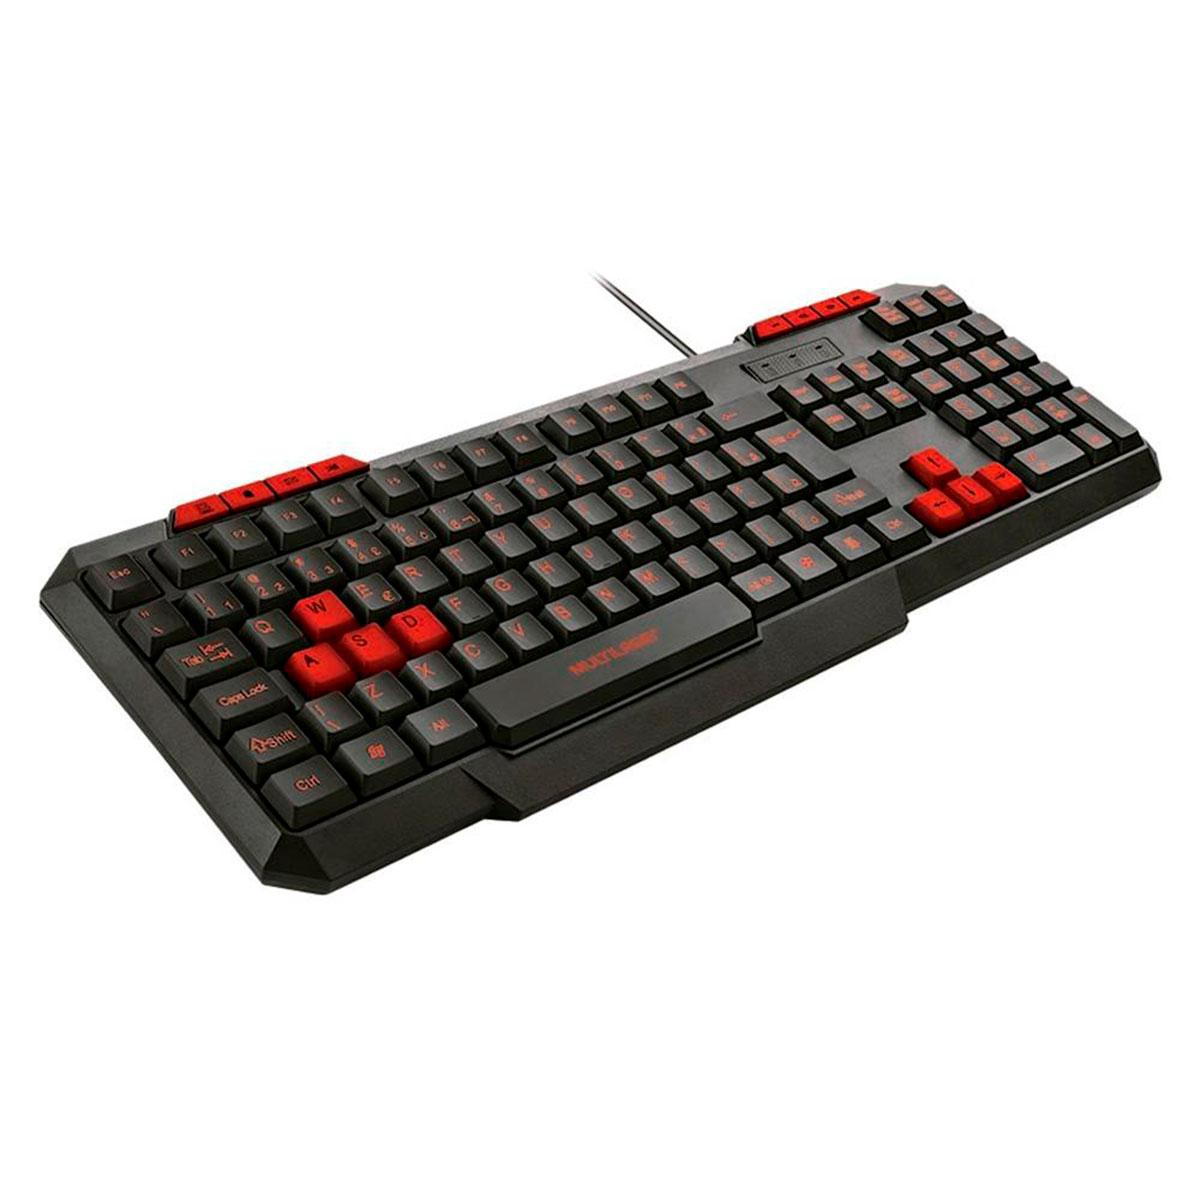 Teclado Gamer Multilaser Multimídia Slim Com Hotkeys Preto e Vermelho - TC242